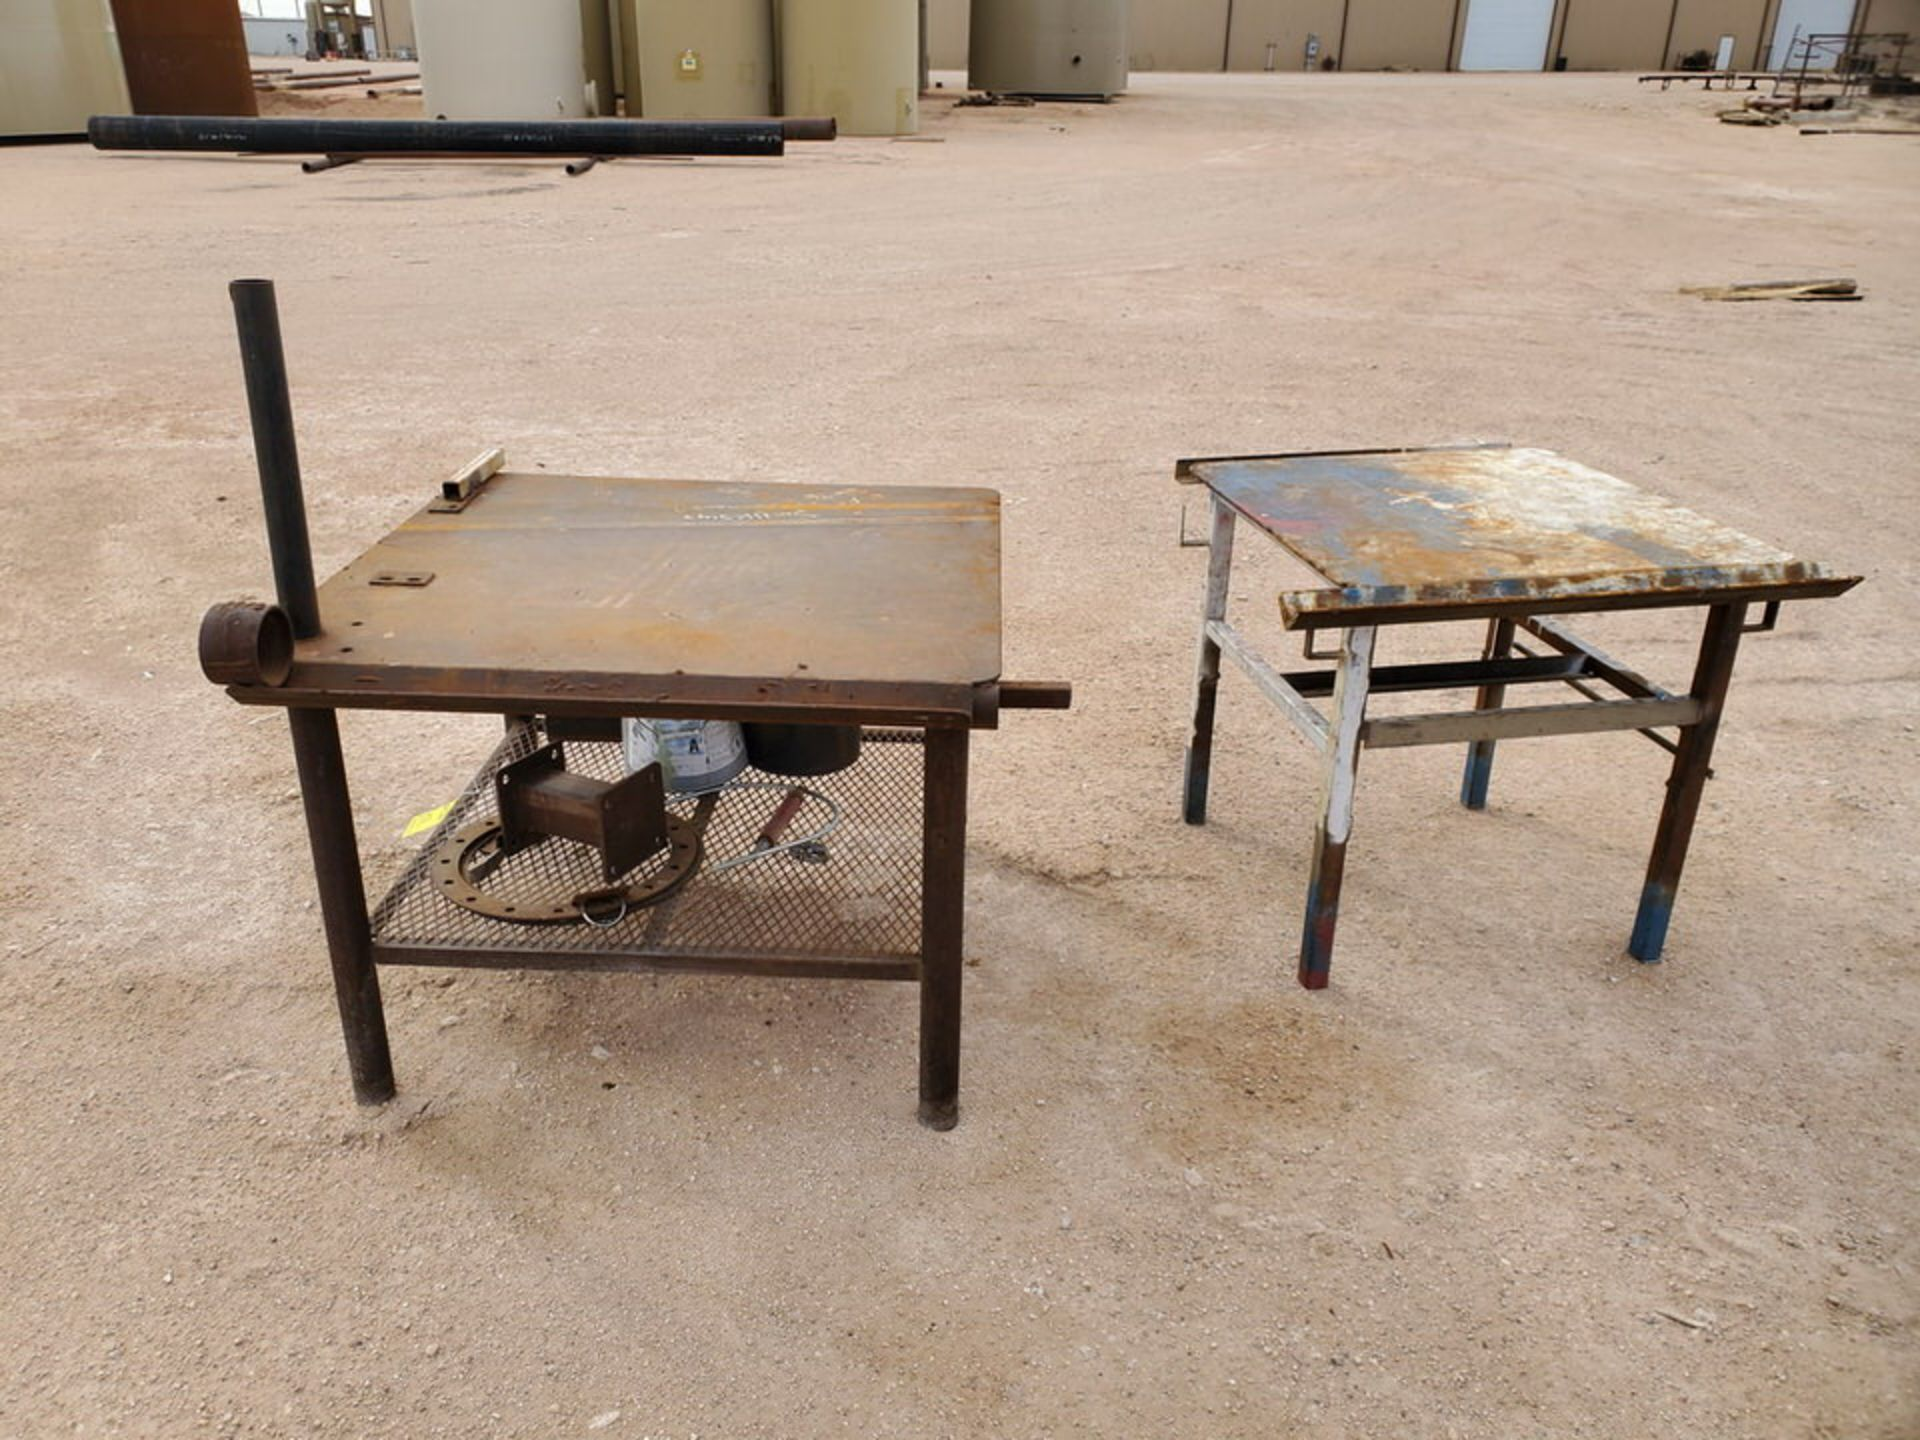 "(2) Stl Welding Tables (1) 43"" x 48"" x 36"", (1) 39"" x 36"" x 36"" - Image 5 of 5"